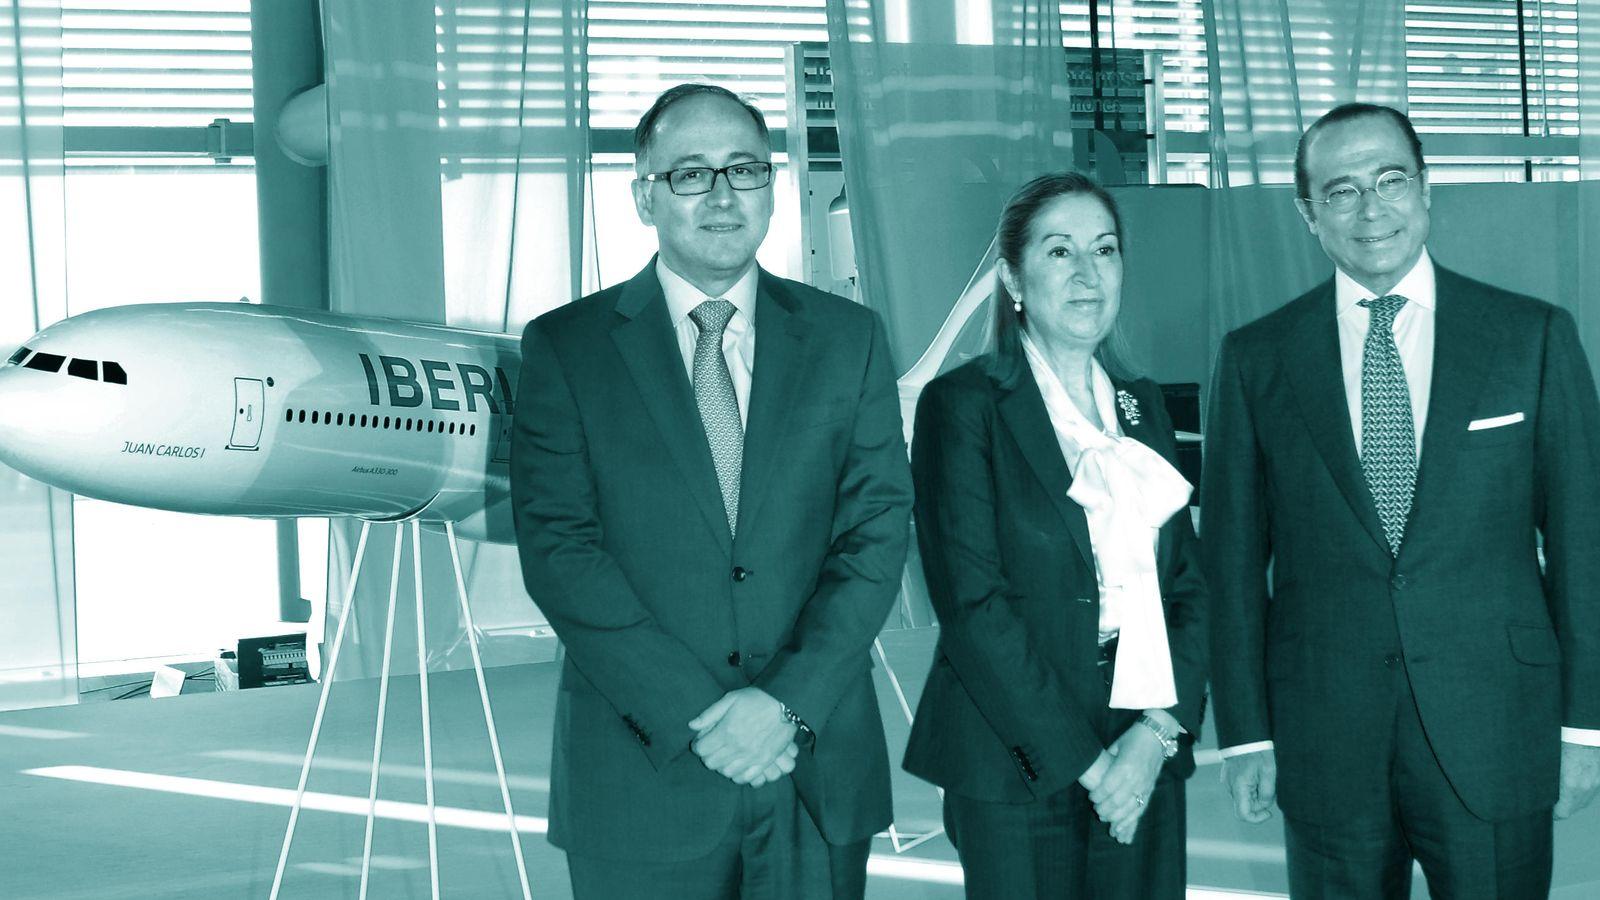 Foto: Luis Gallego, presidente de Iberia, Ana Pastor, ministra de Fomento, y Antonio Vázquez, presidente no ejecutivo de IAG. (Foto: Iberia)